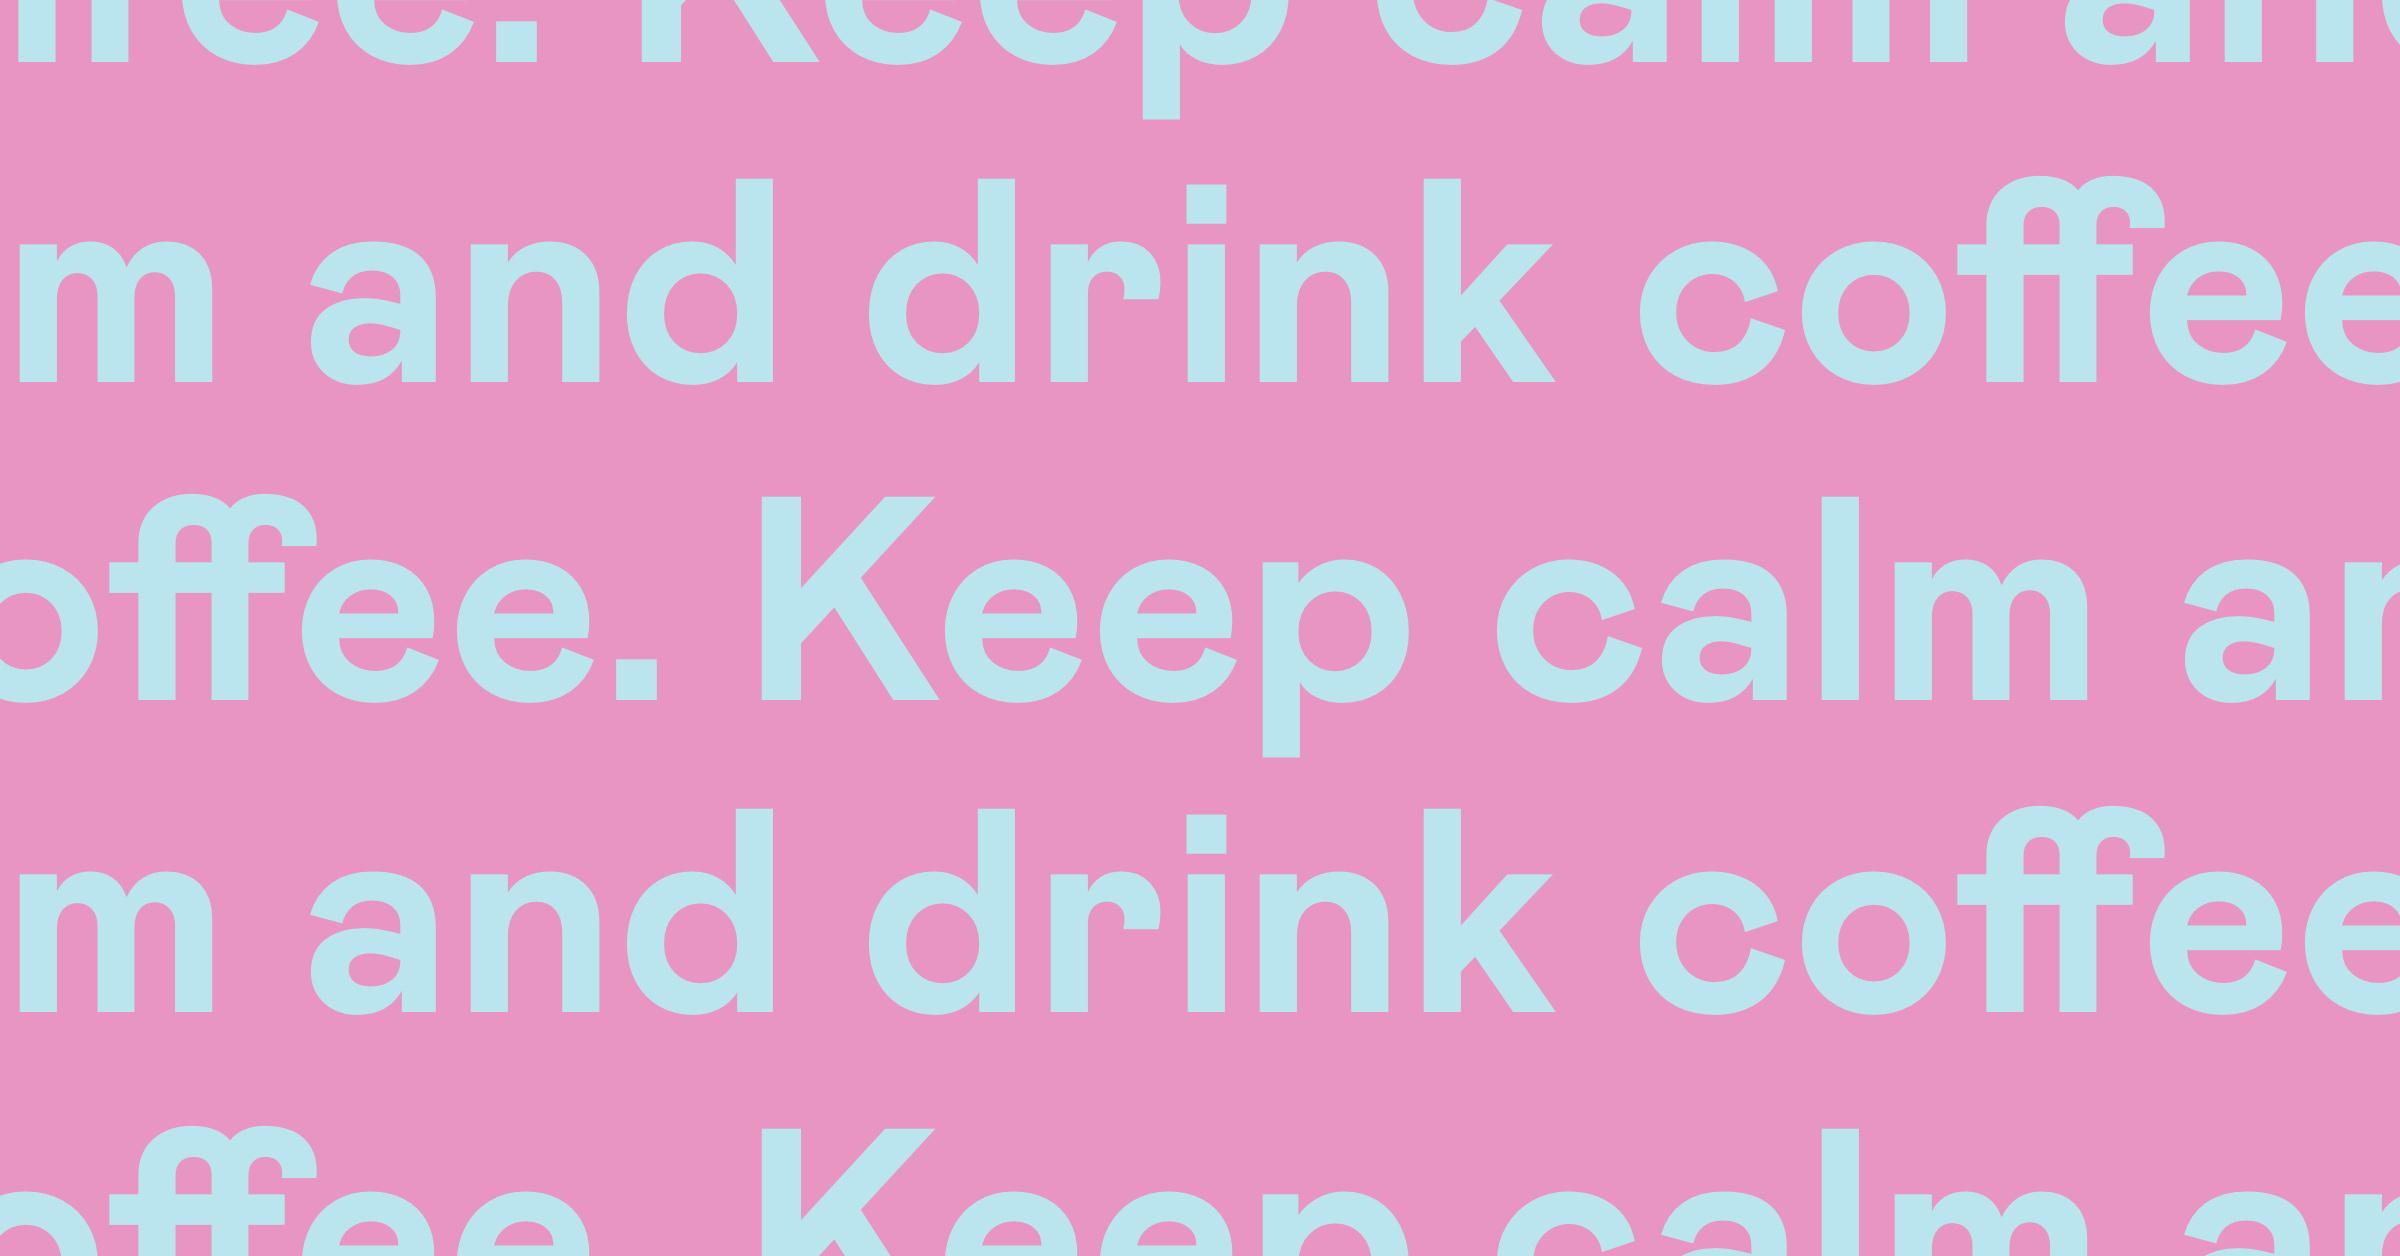 text: keep calm, drink coffee